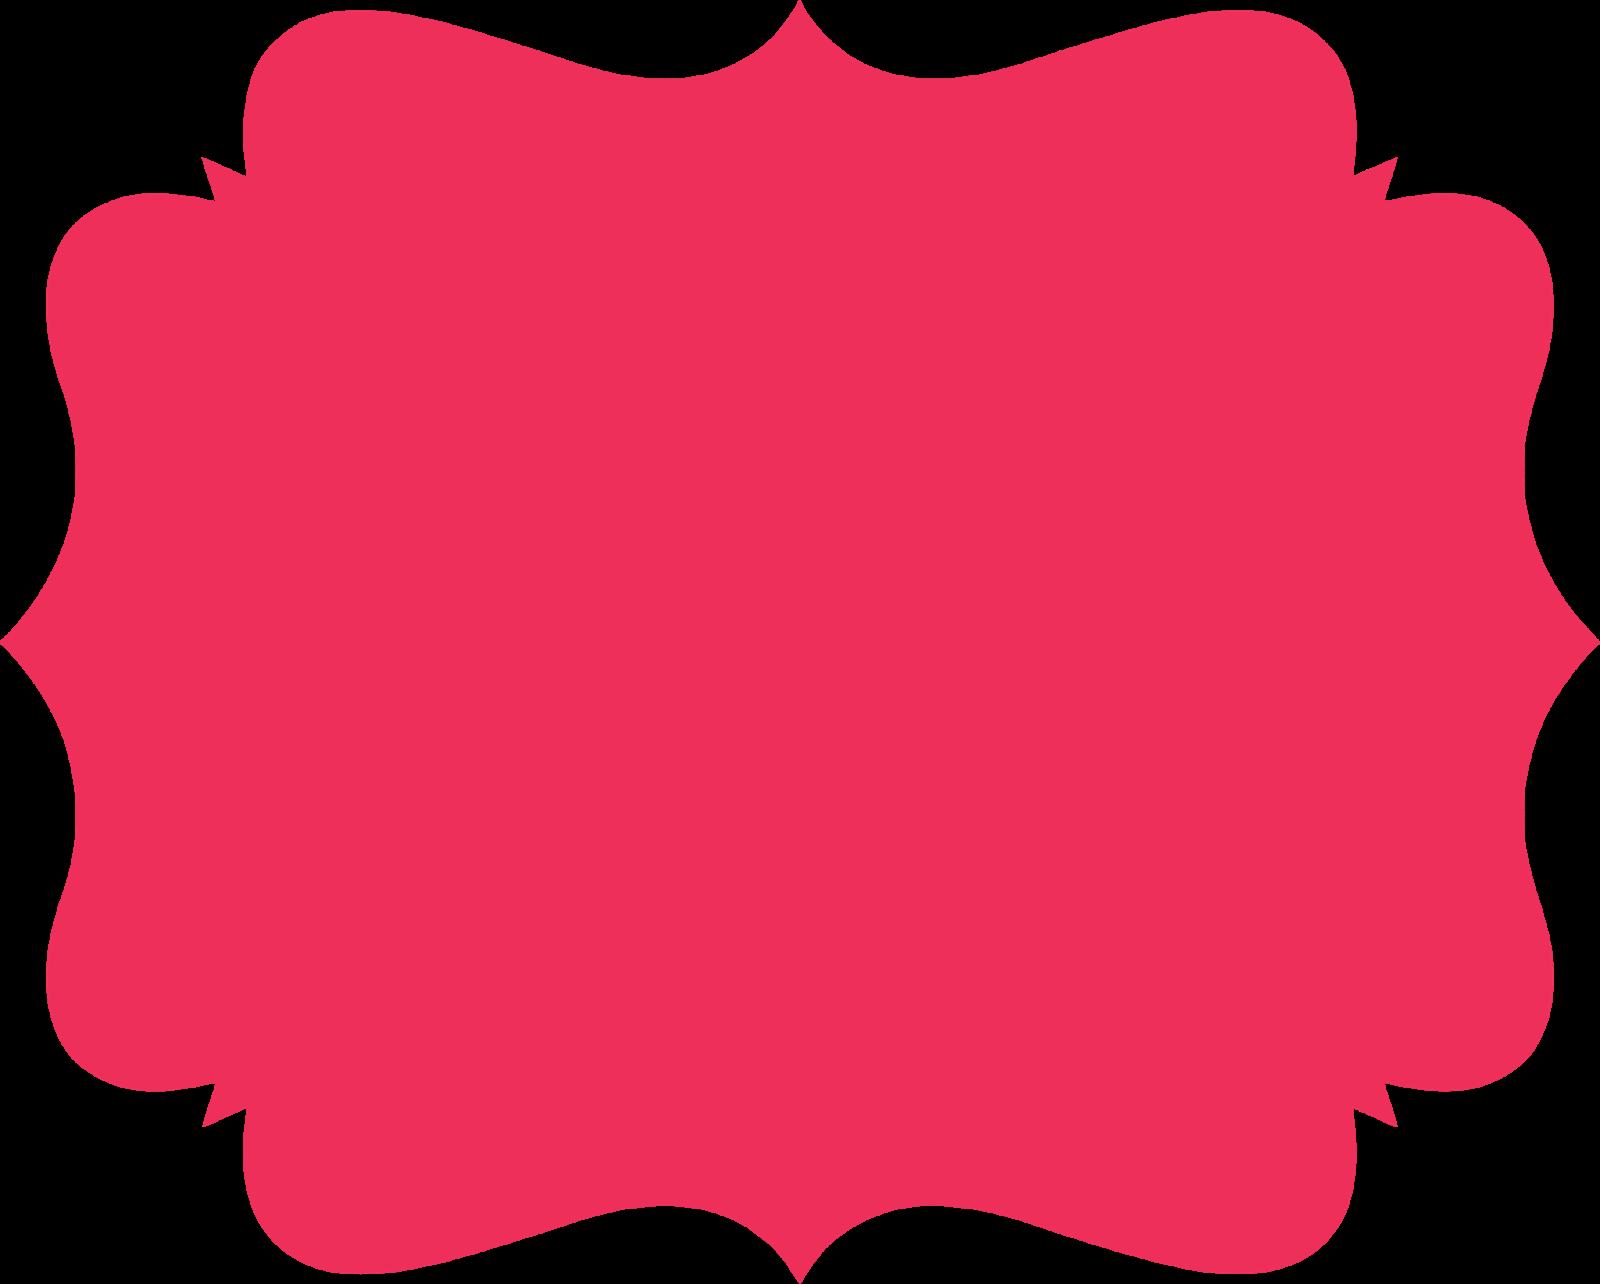 Label clipart text box. Frames em png gr